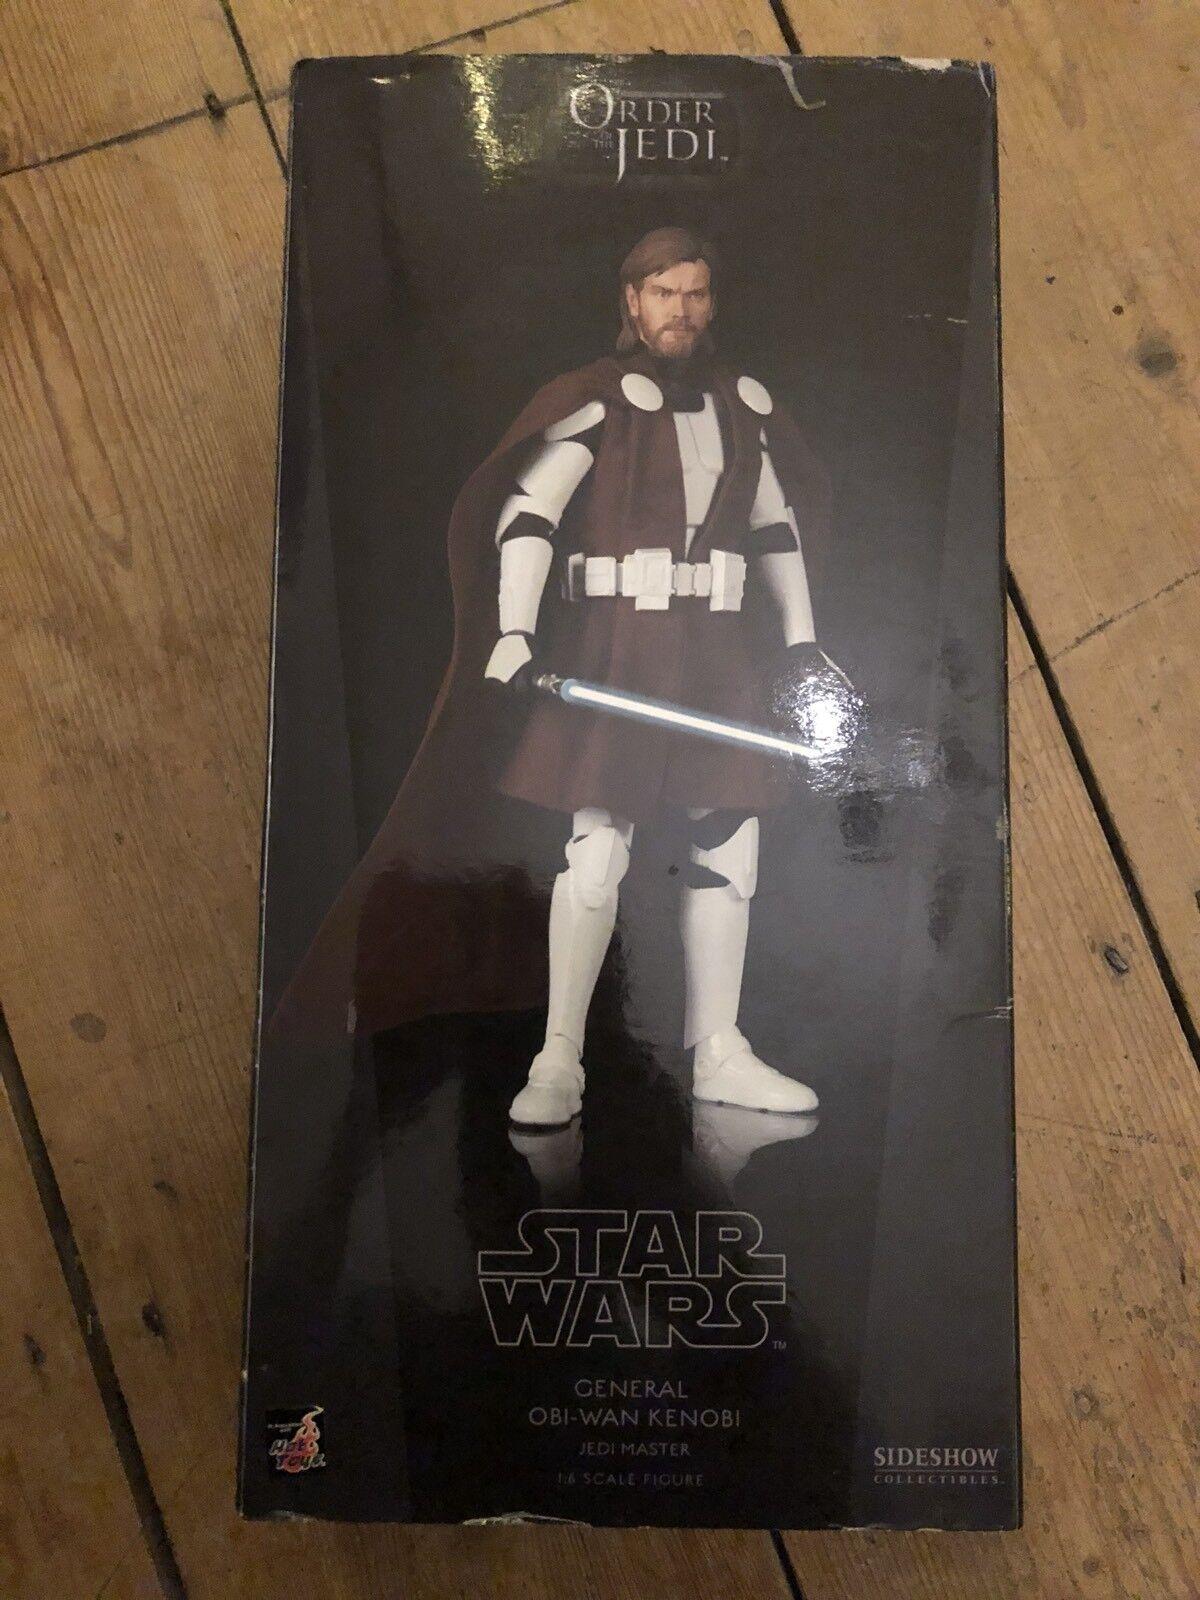 Sideshow Star Wars Order Of The Jedi General Obi Obi Obi Wan Kenobi  Jedi Master SC1069 9000f2